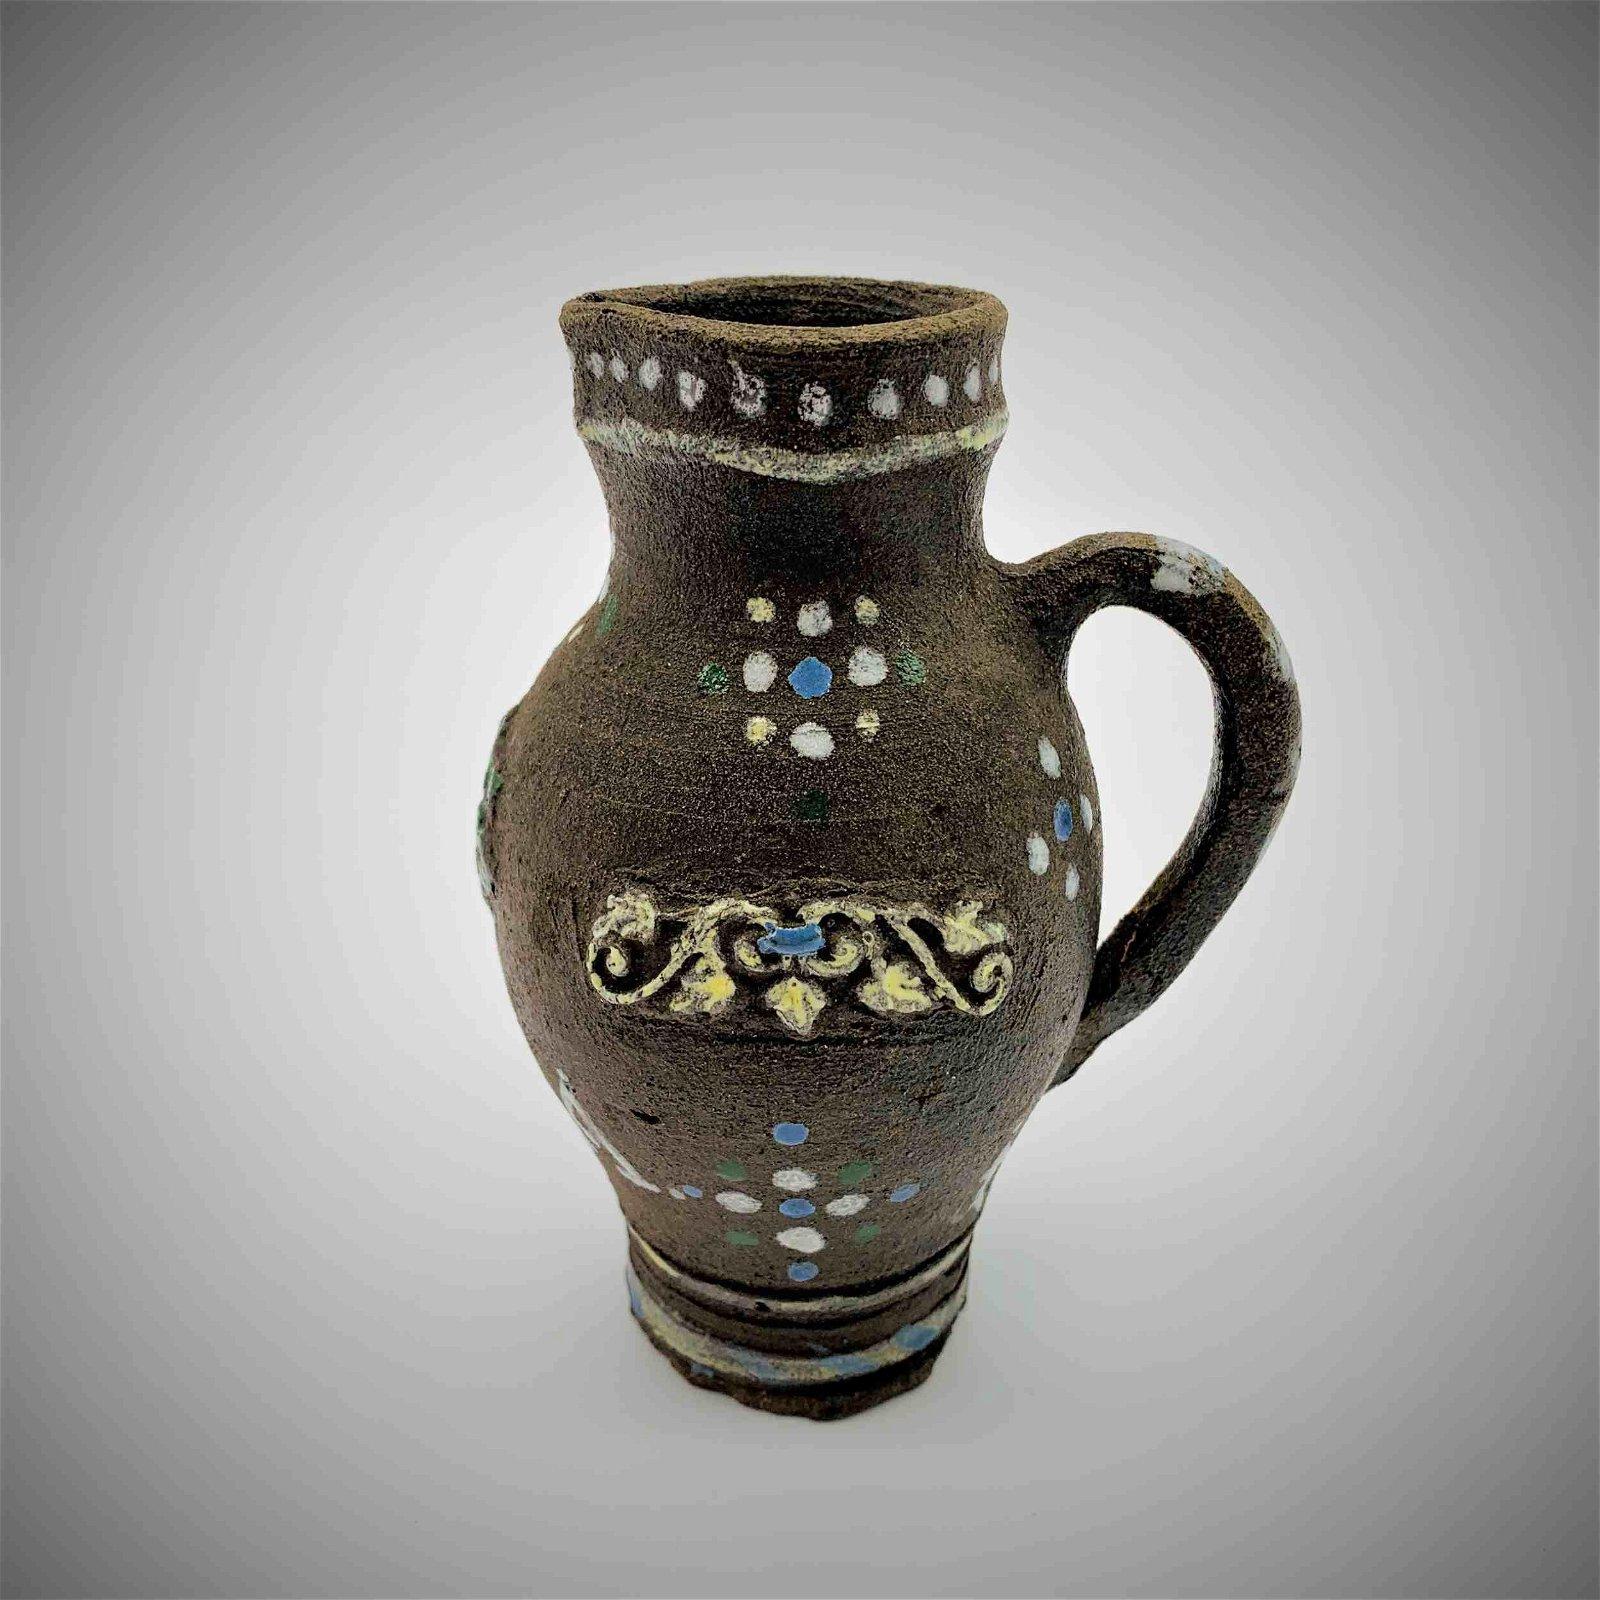 Circa 1622 Miniature Salt Glazed Stoneware Jug